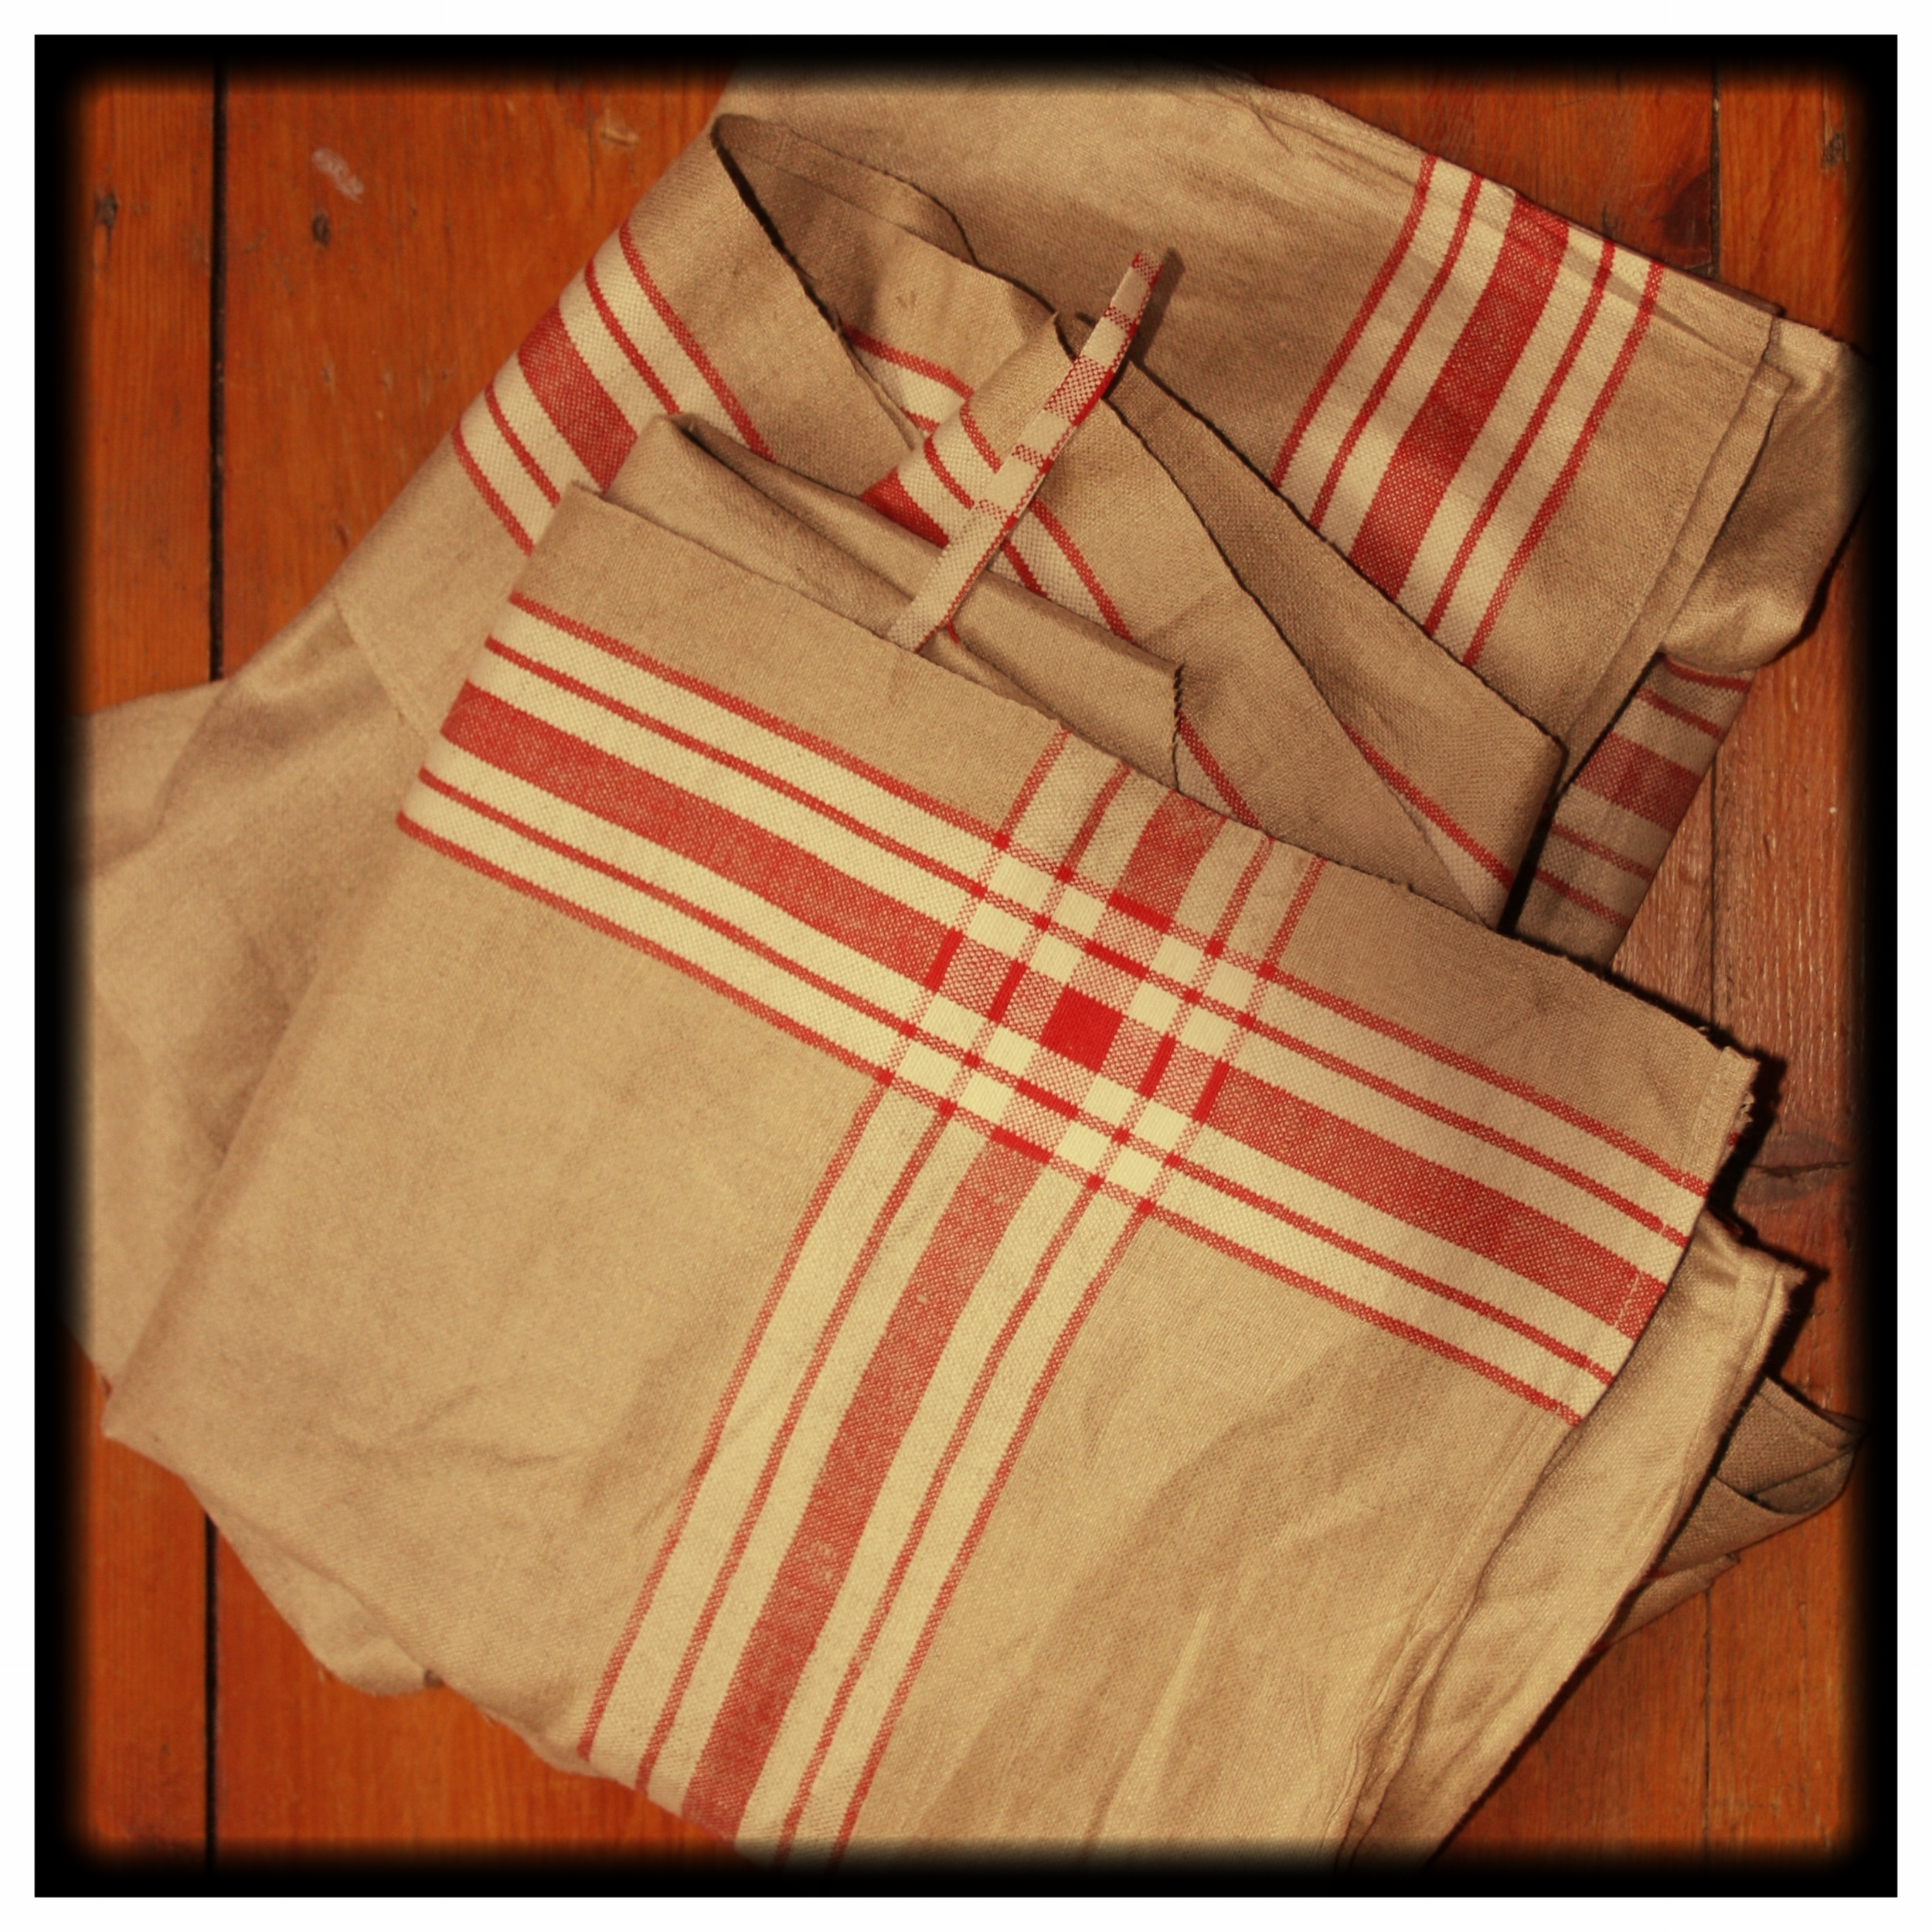 Antique Mangle Cloth